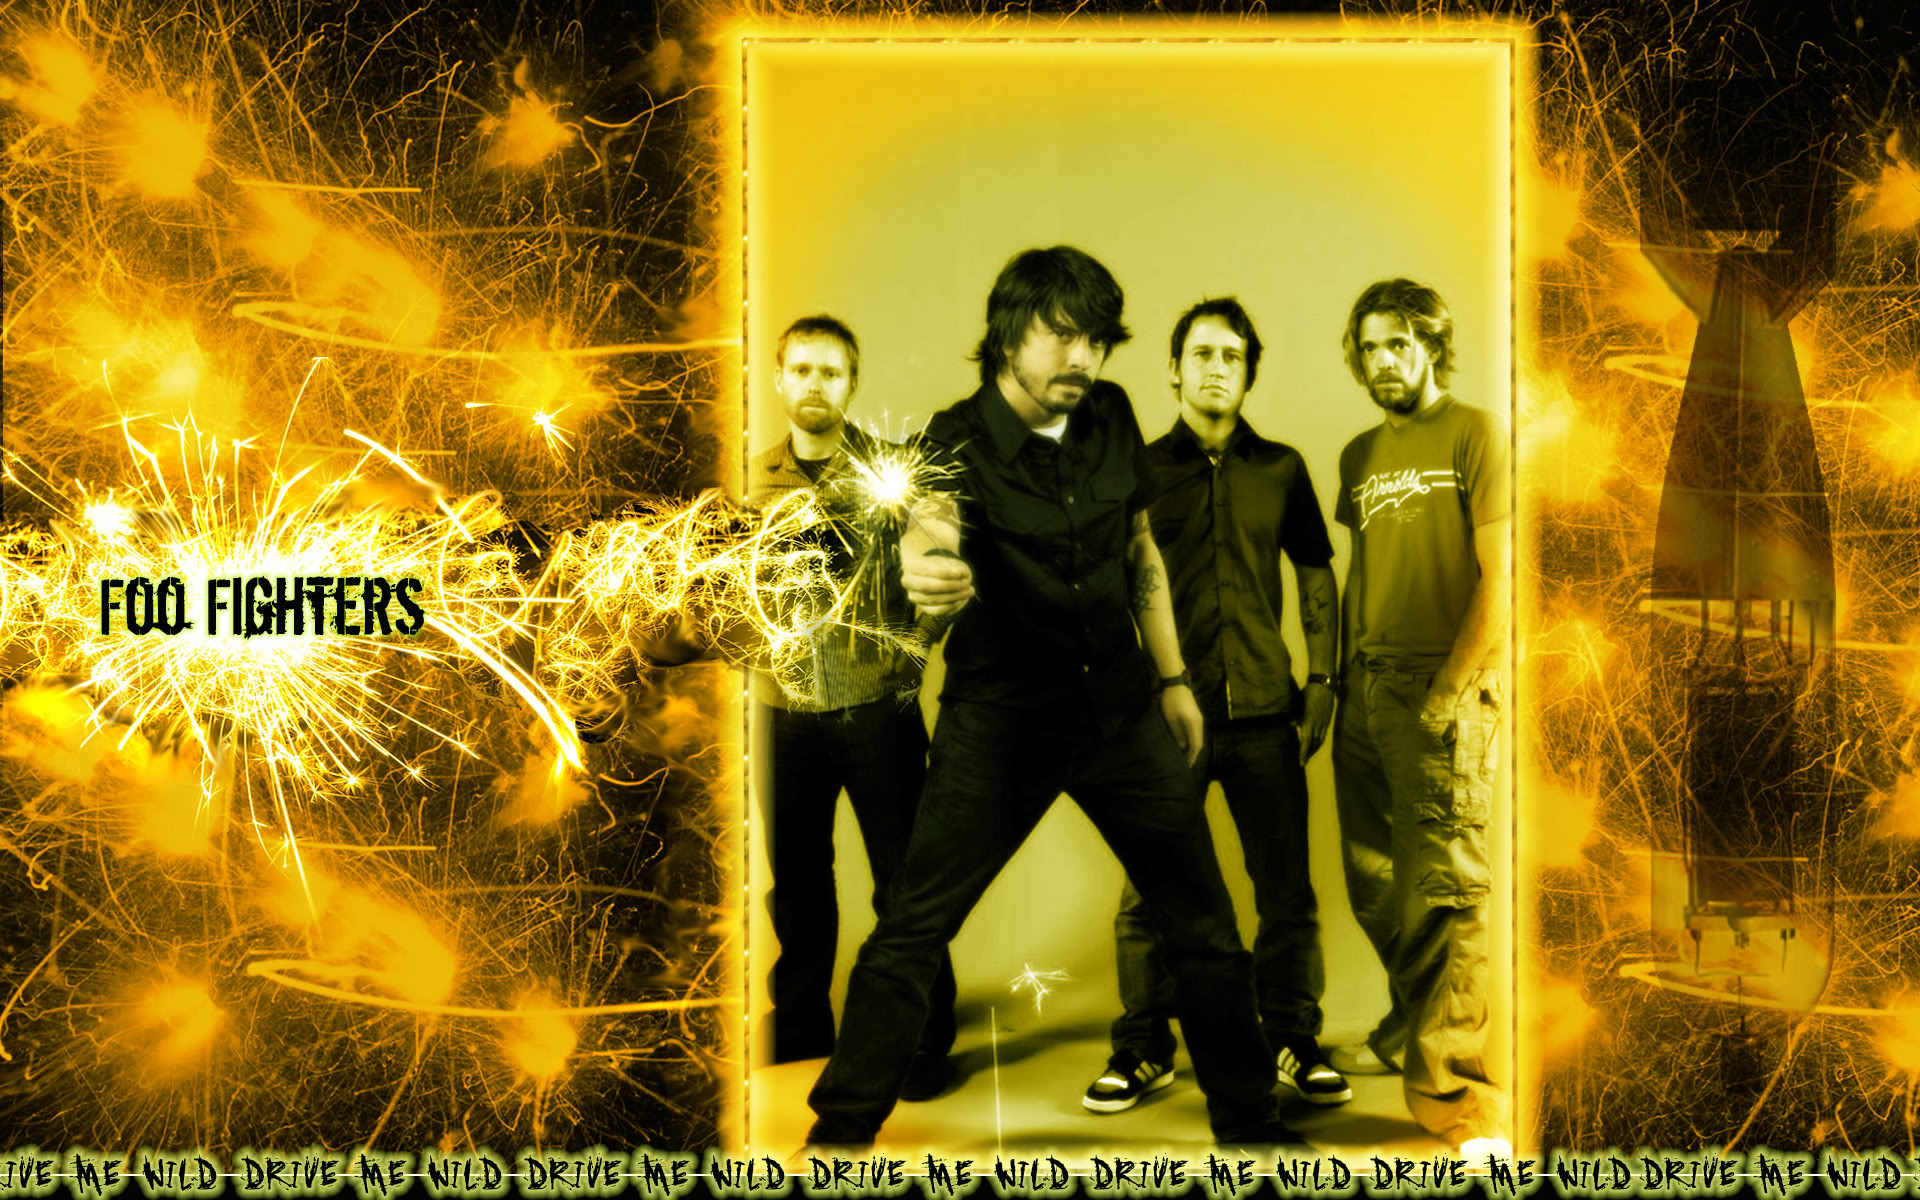 Foo Fighters 1920x1200